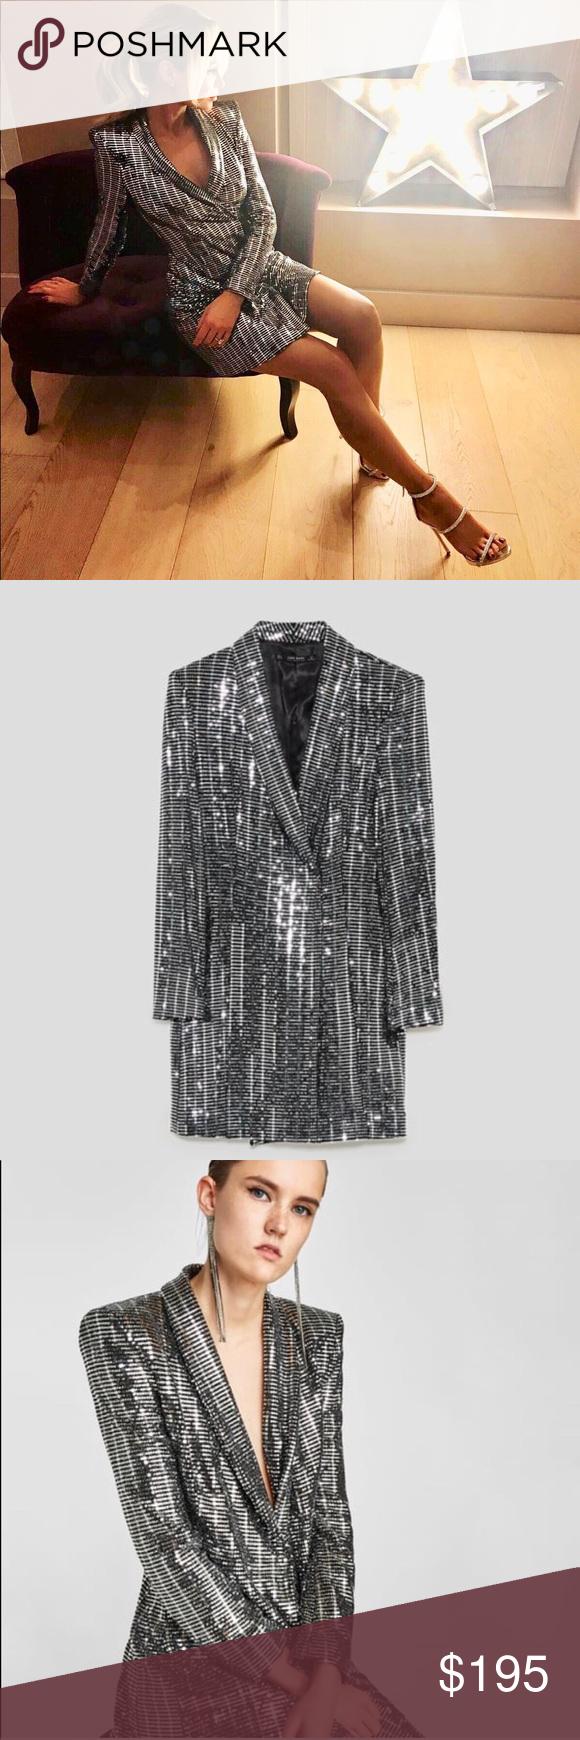 5371de2d Zara sequin silver tuxedo blazer dress - XS Brand new never worn. Size XS.  Sold out everywhere Zara Dresses Mini